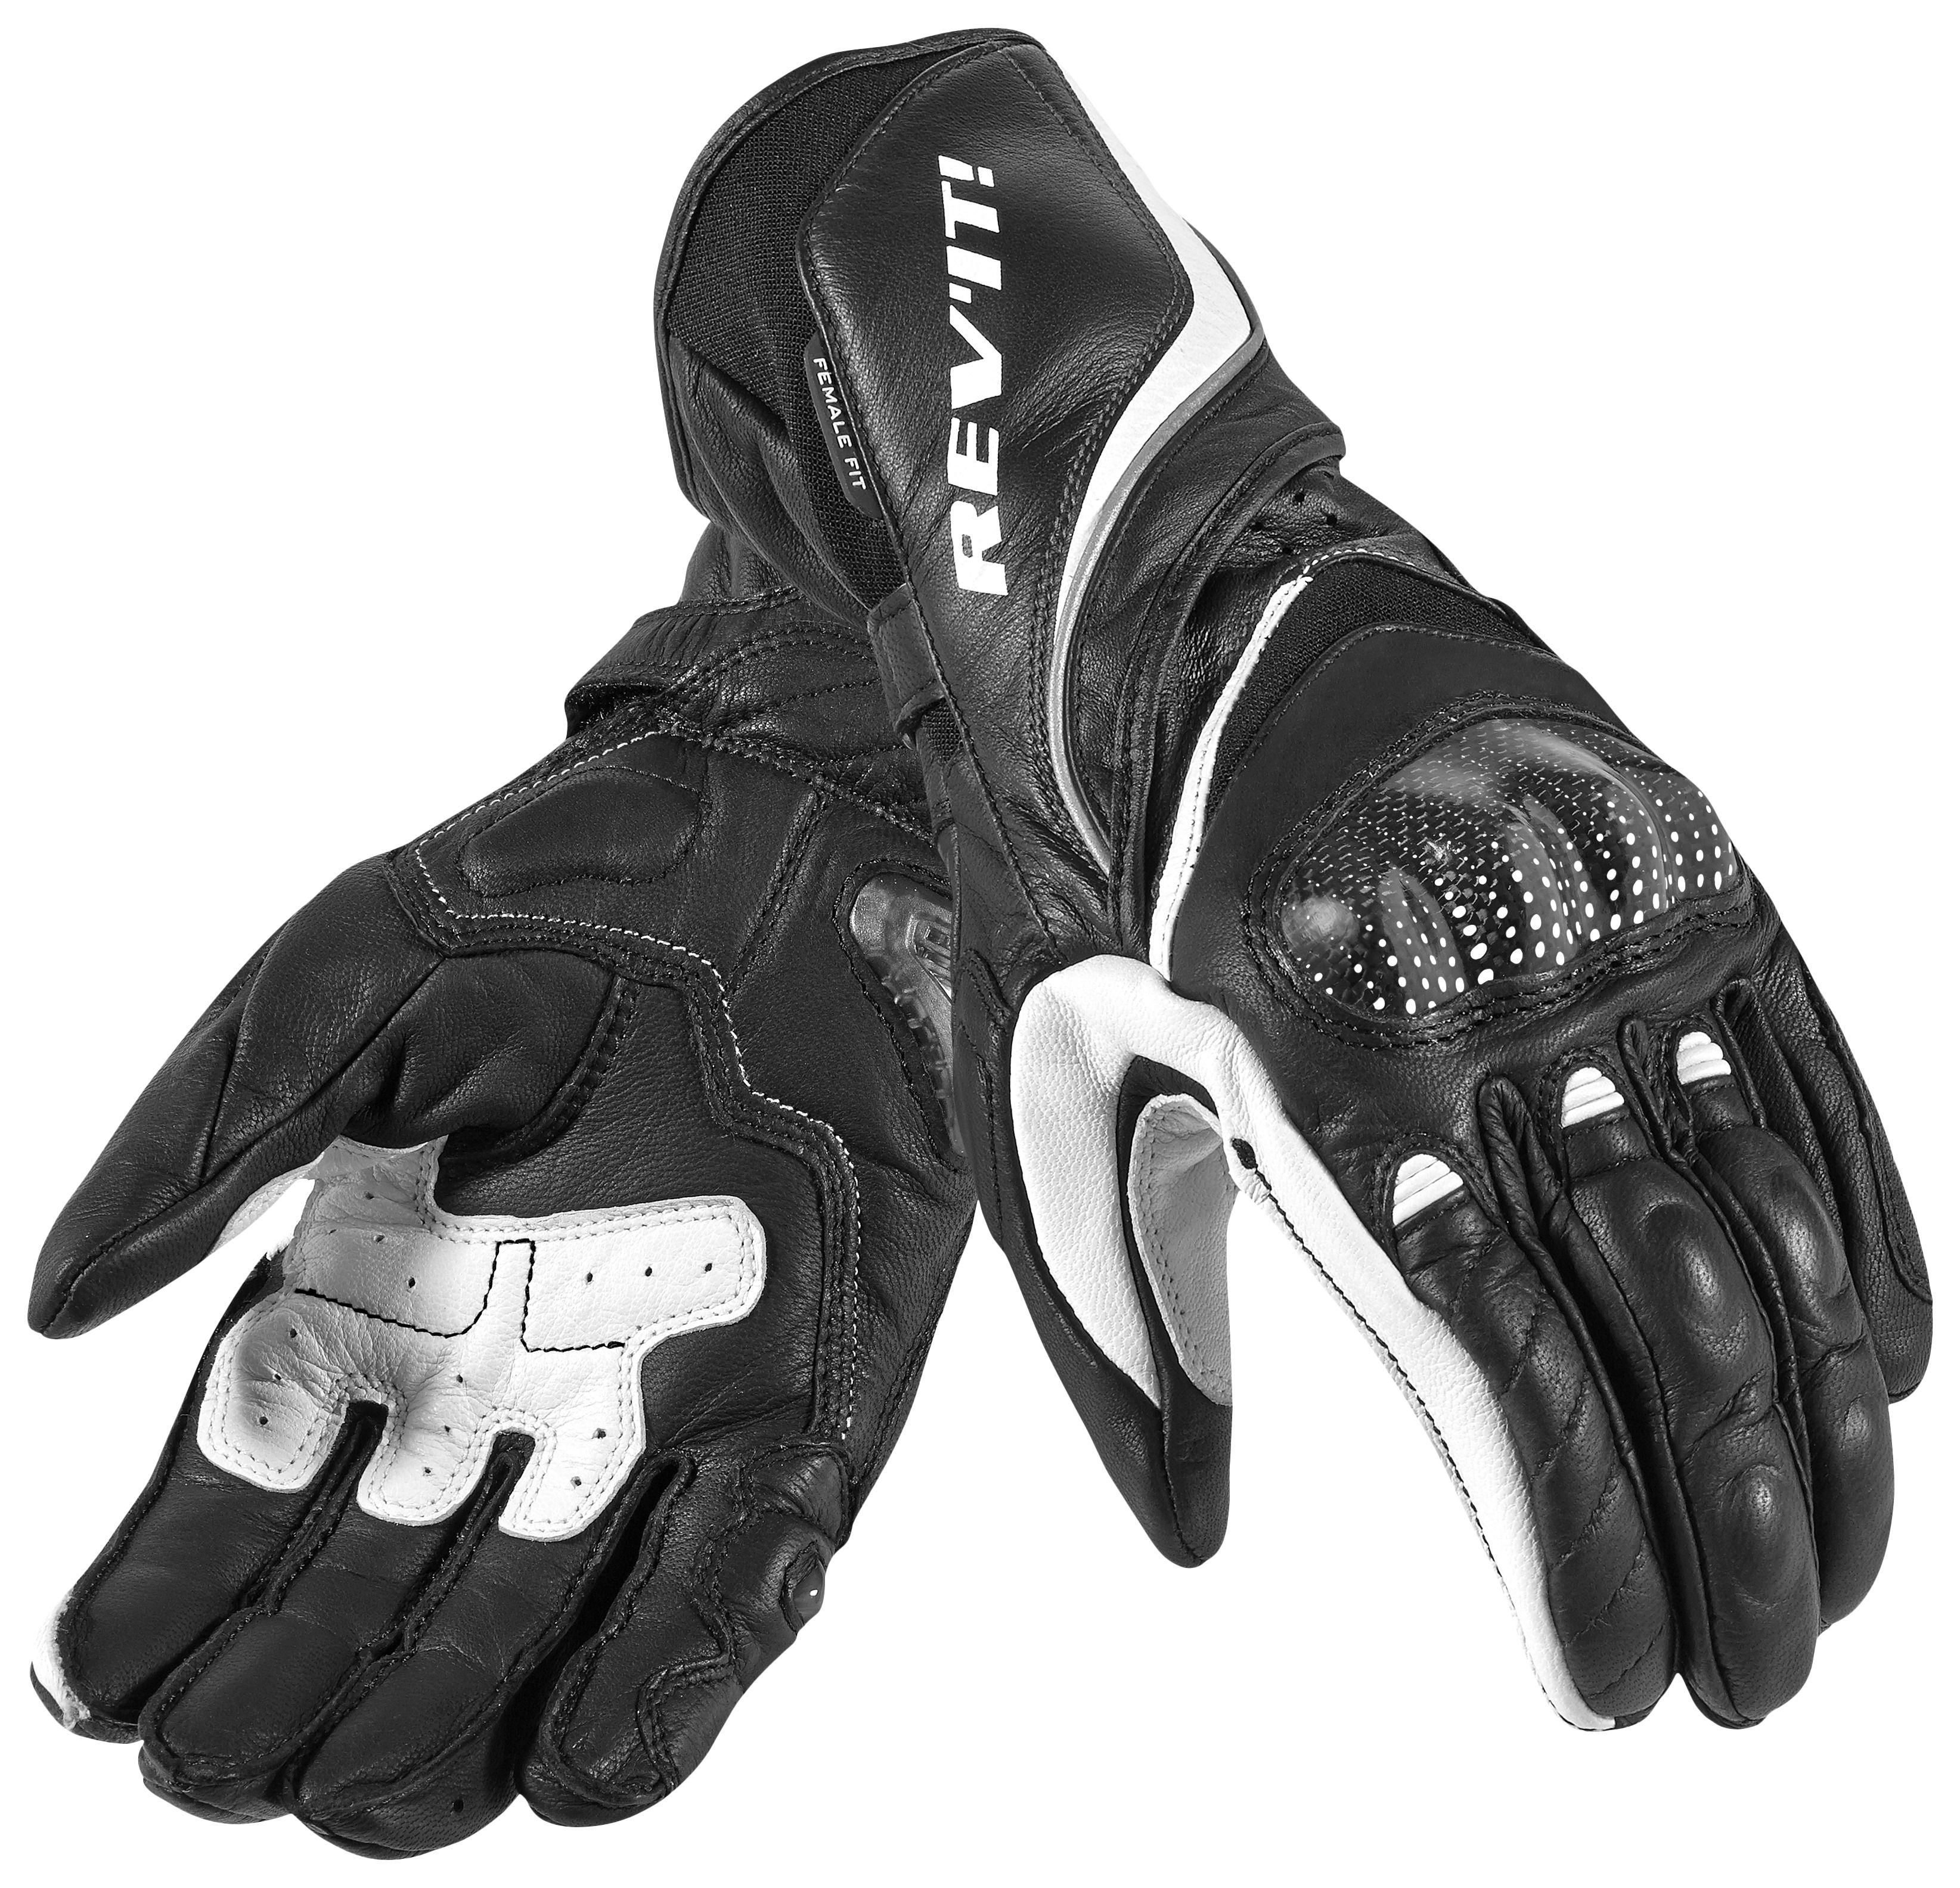 Ladies leather golf gloves uk - Xena Women S Gloves Revzilla